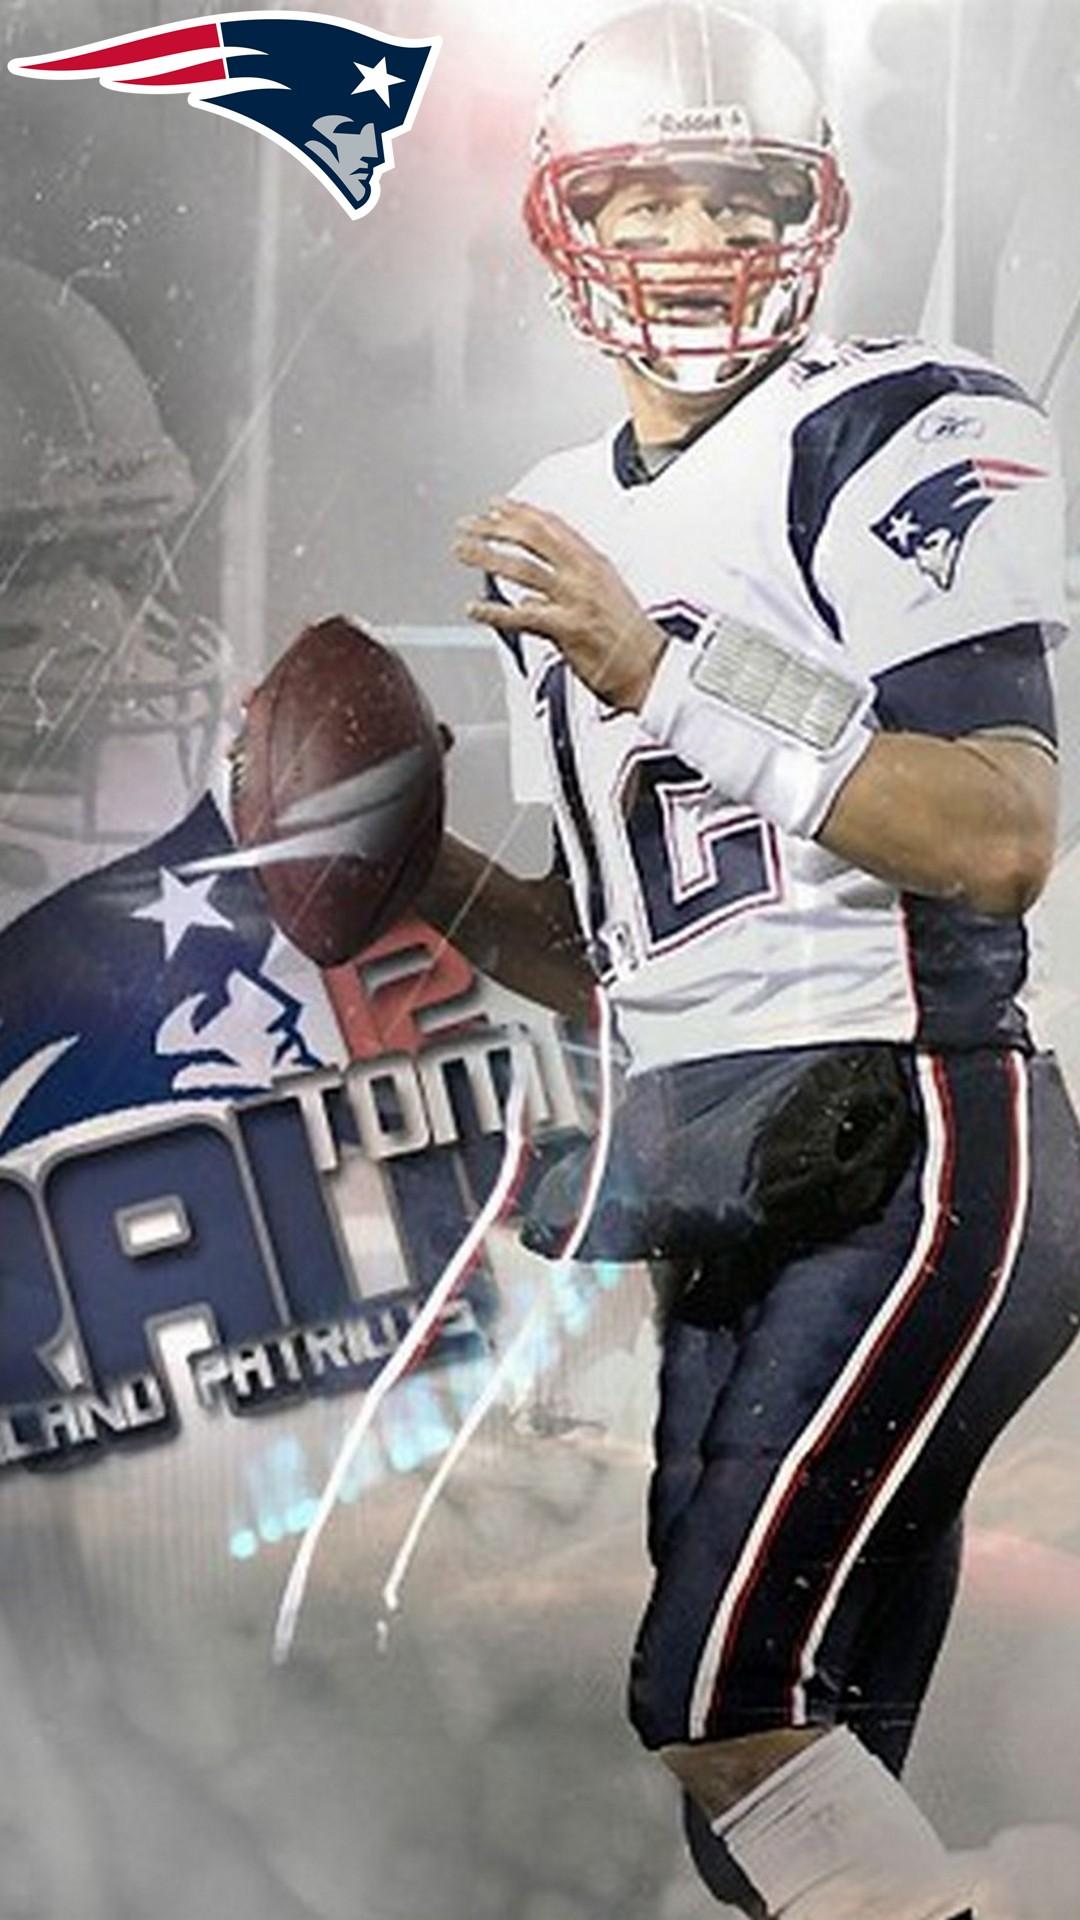 Tom Brady Patriots iPhone 8 Wallpaper 2020 NFL Football Wallpapers 1080x1920